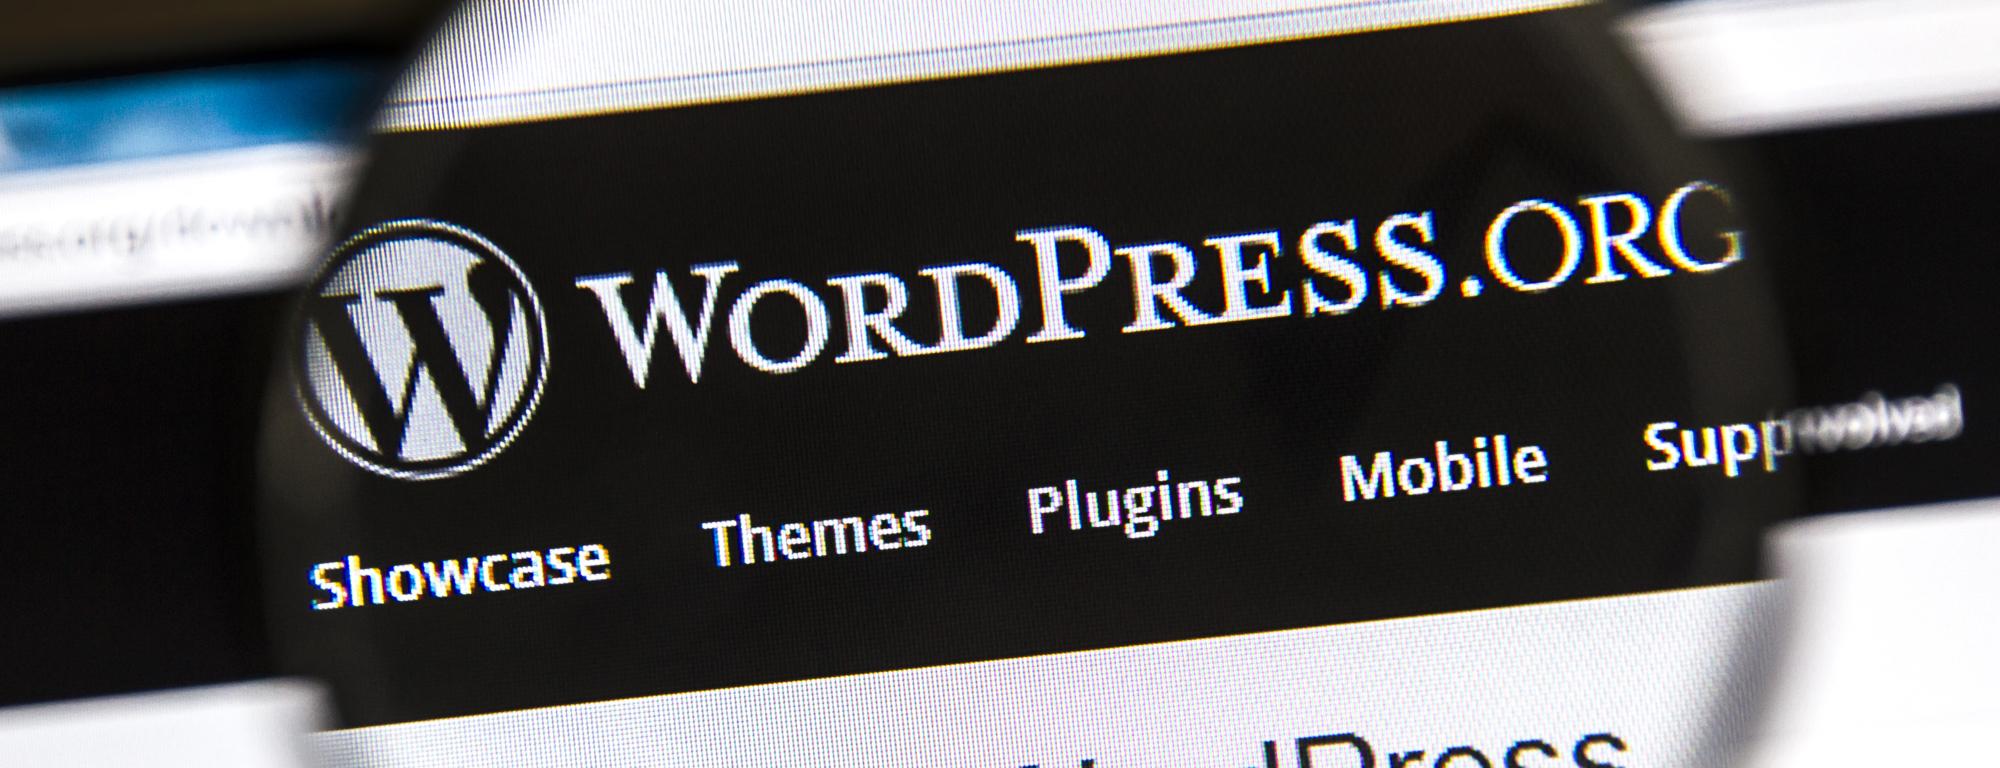 Grab this WordPress Starter Kit and Themes Bundle